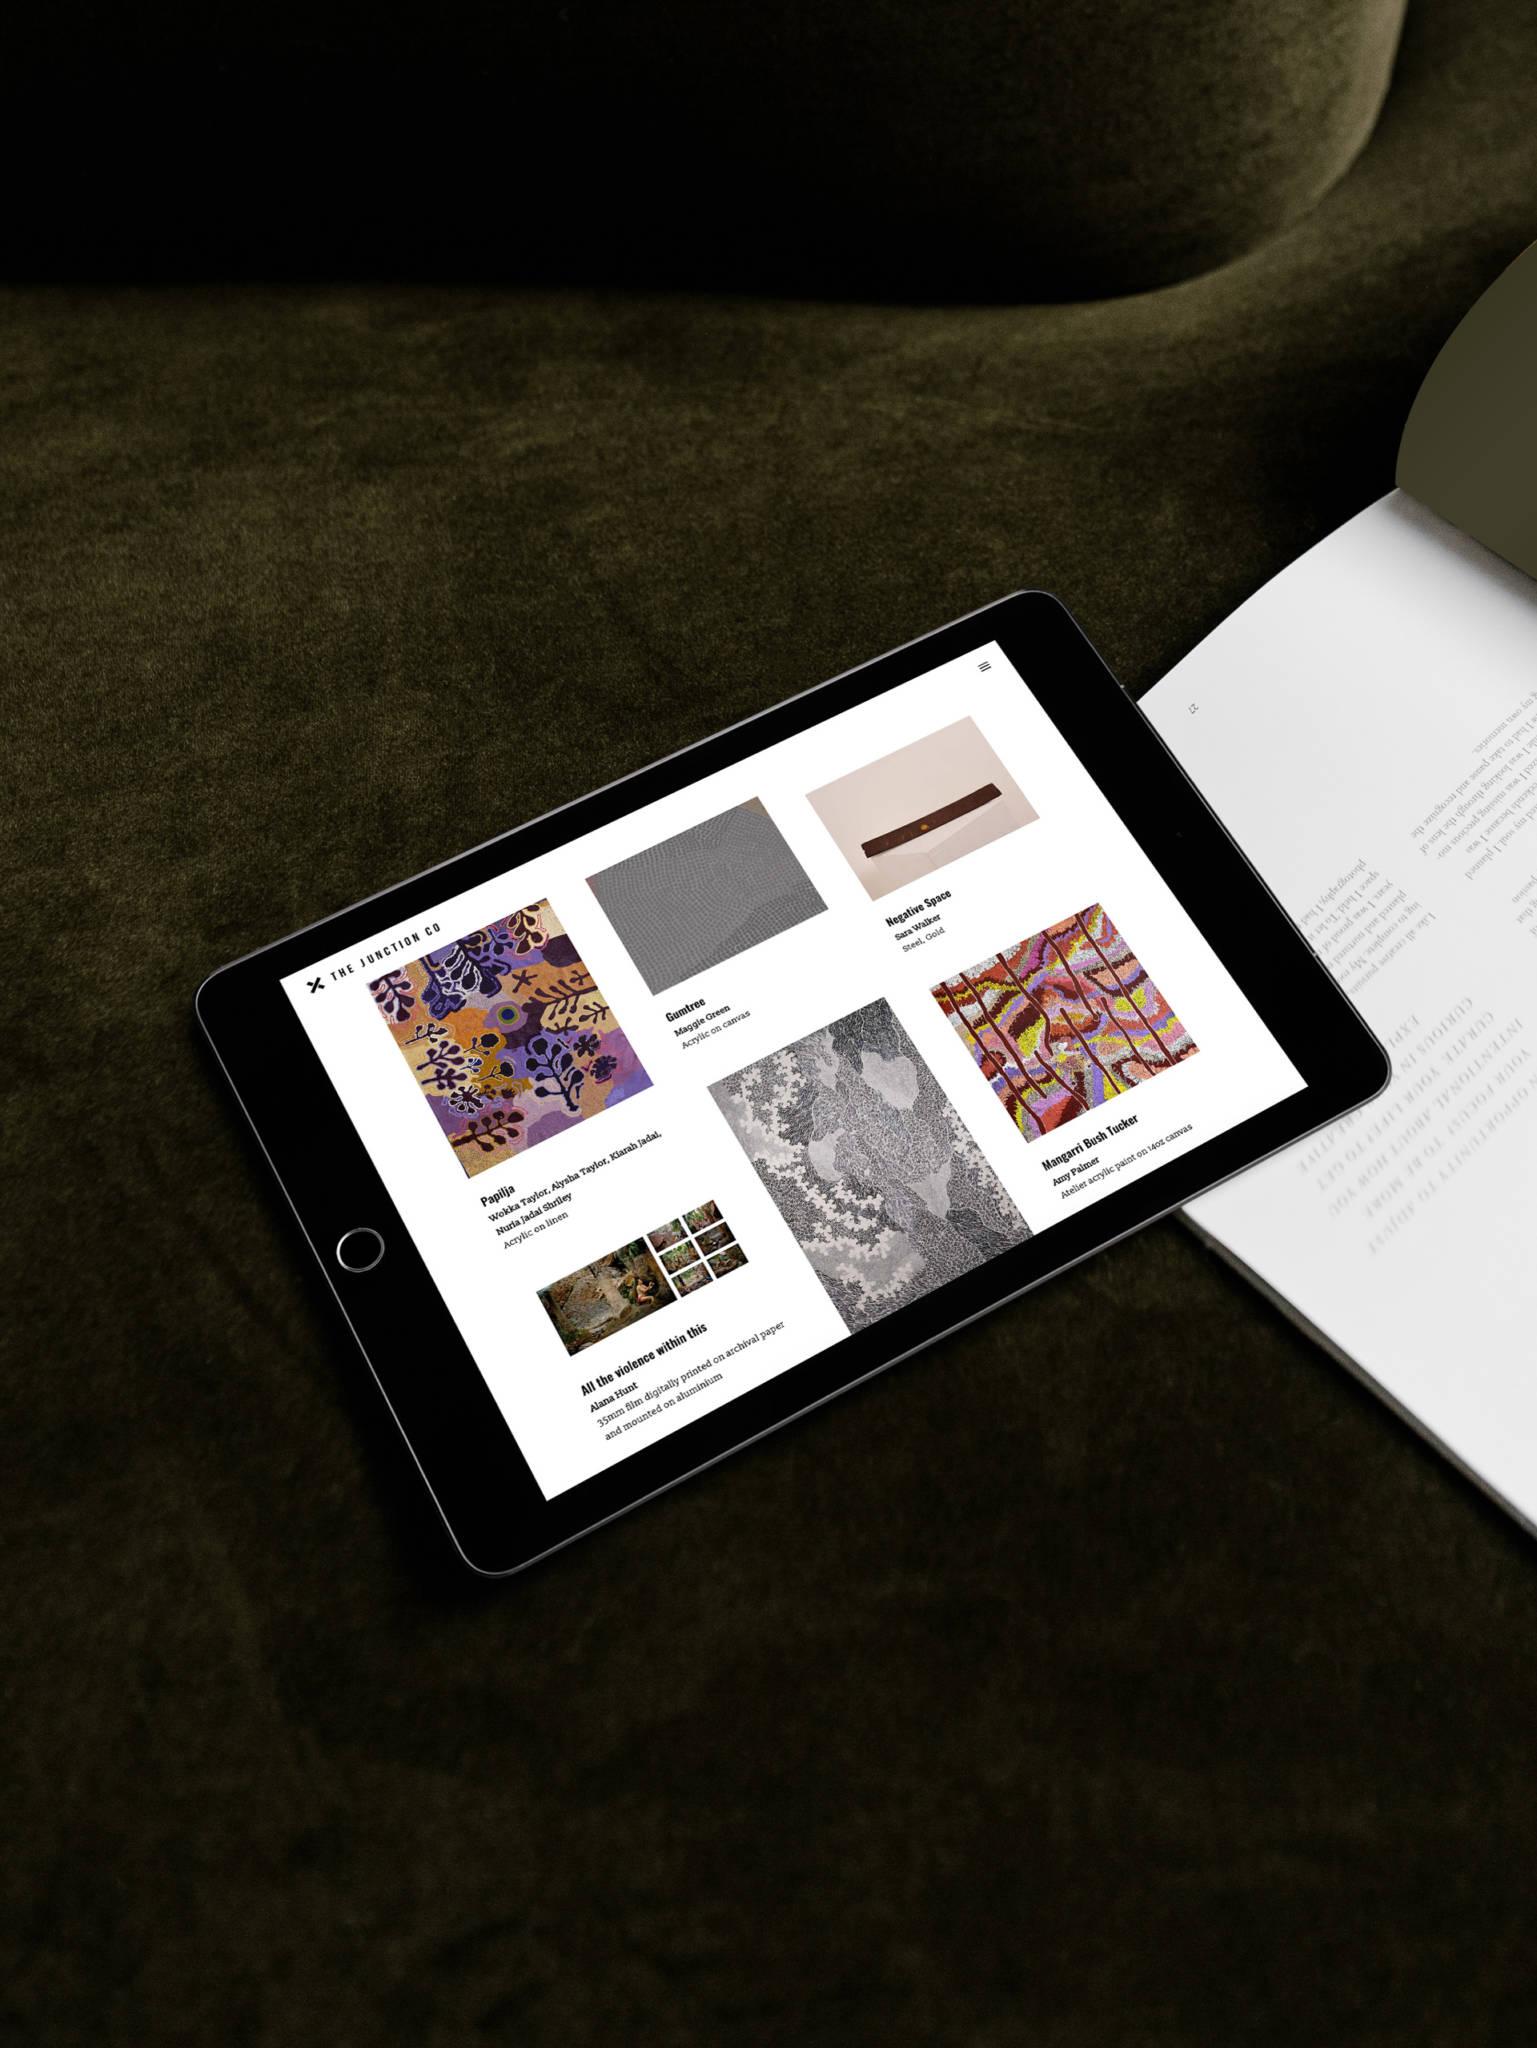 virtual gallery tablet